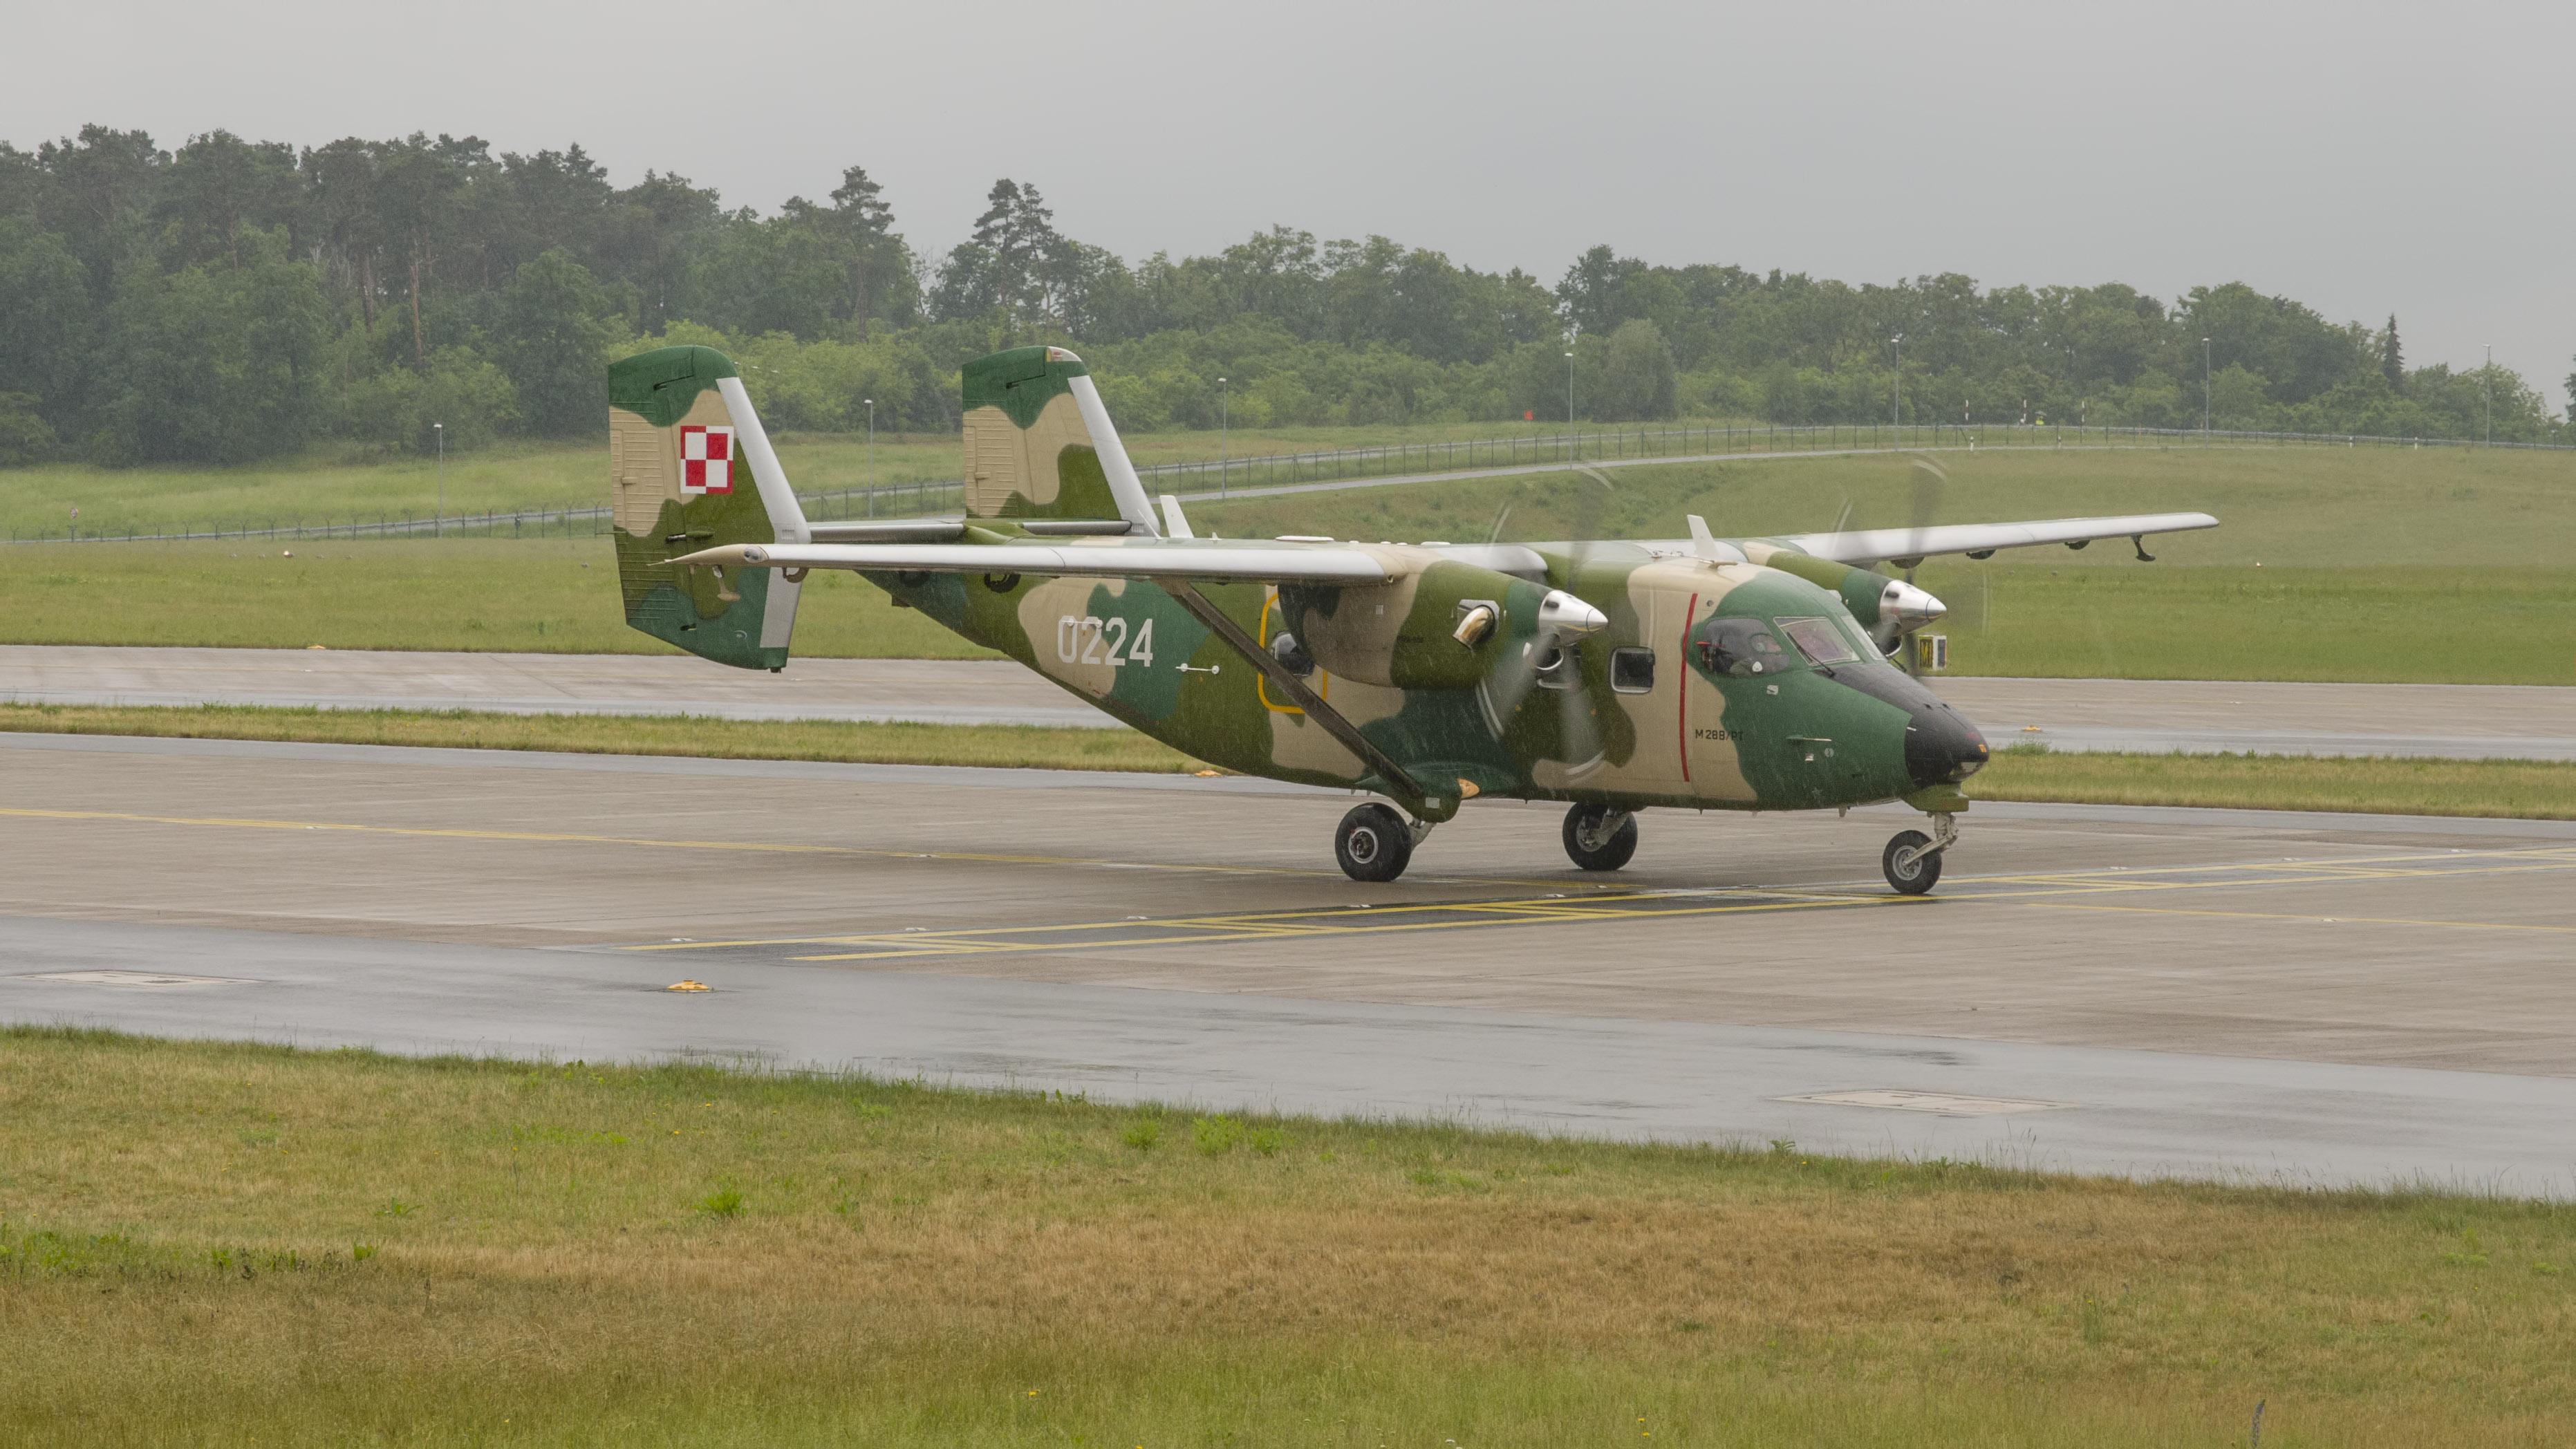 _IMG1779 PZL-Mielec M-28B-PT Bryza 1TD Polish air force 0224